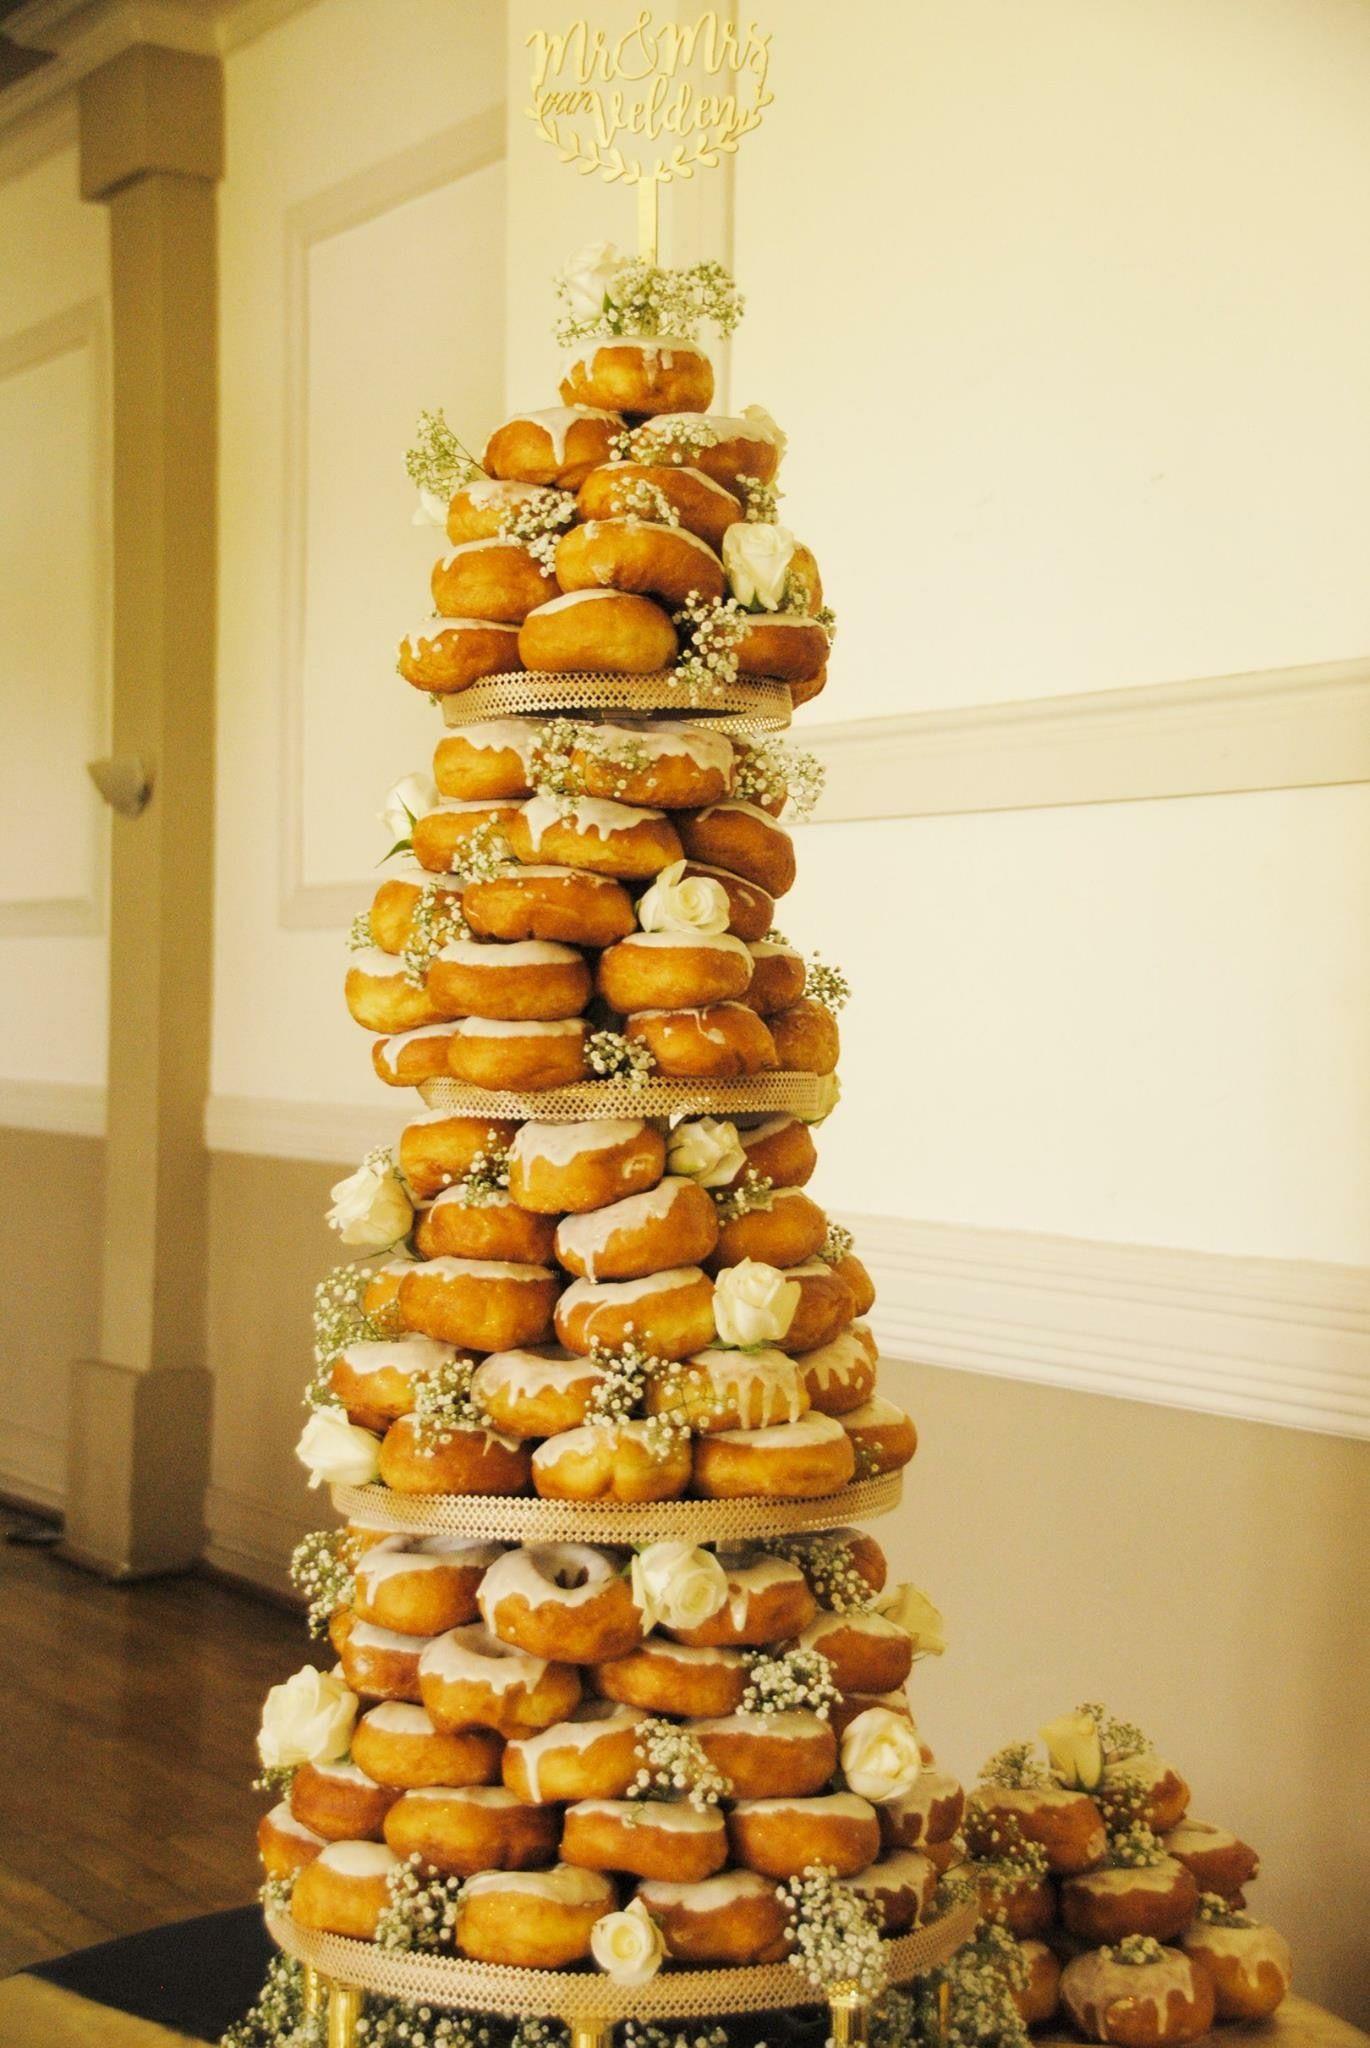 Our doughnut cake #doughnuts #wedding | Best Day Ever | Pinterest ...